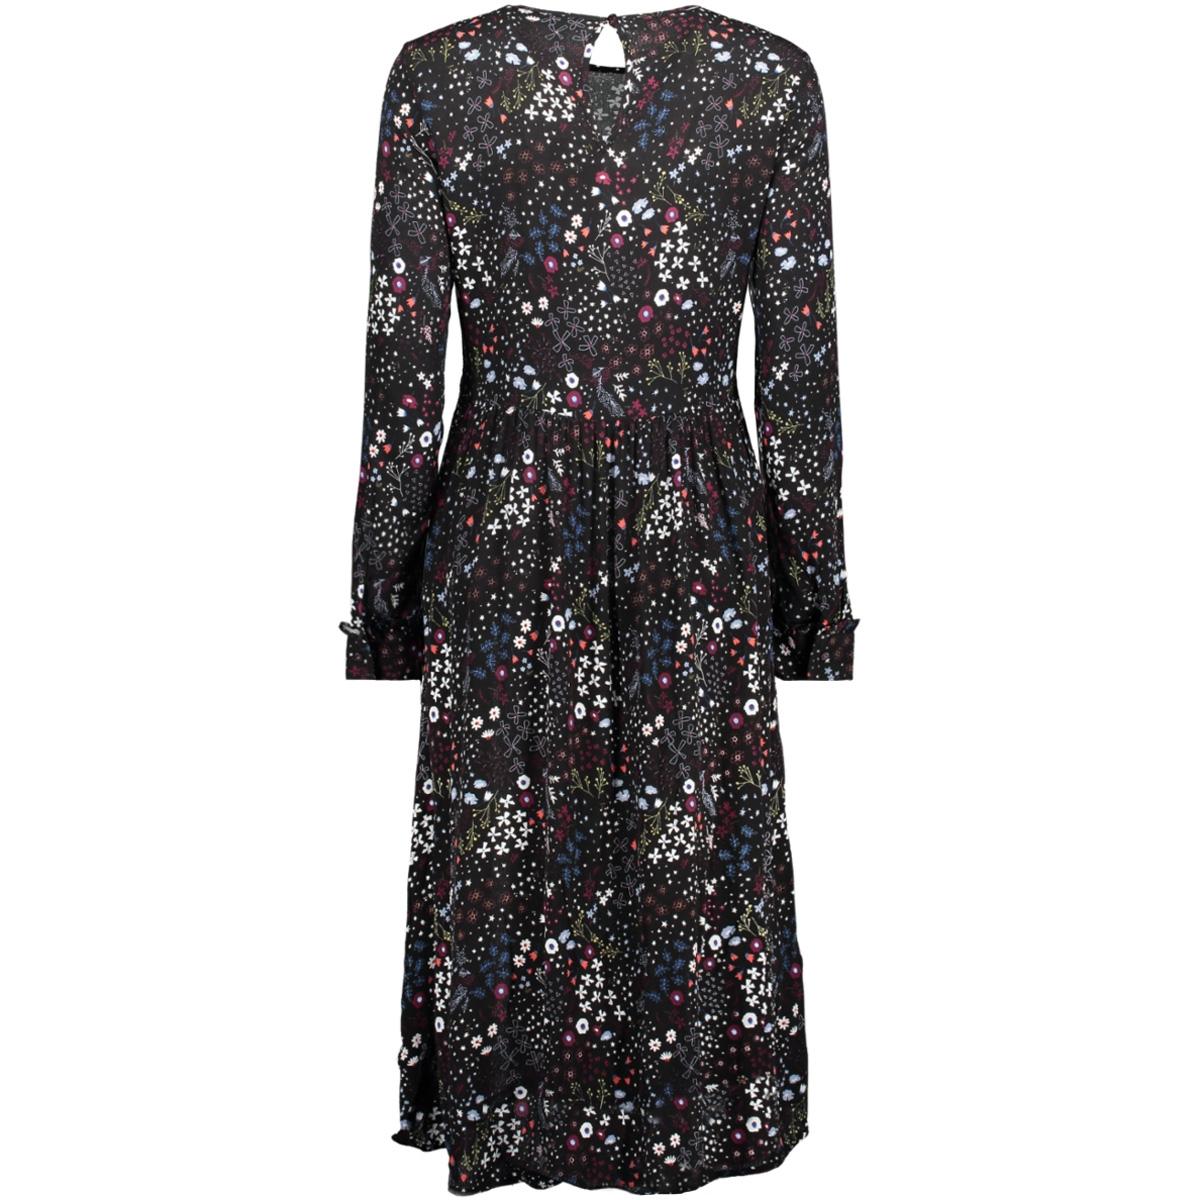 5055017.00.71 tom tailor jurk 1003